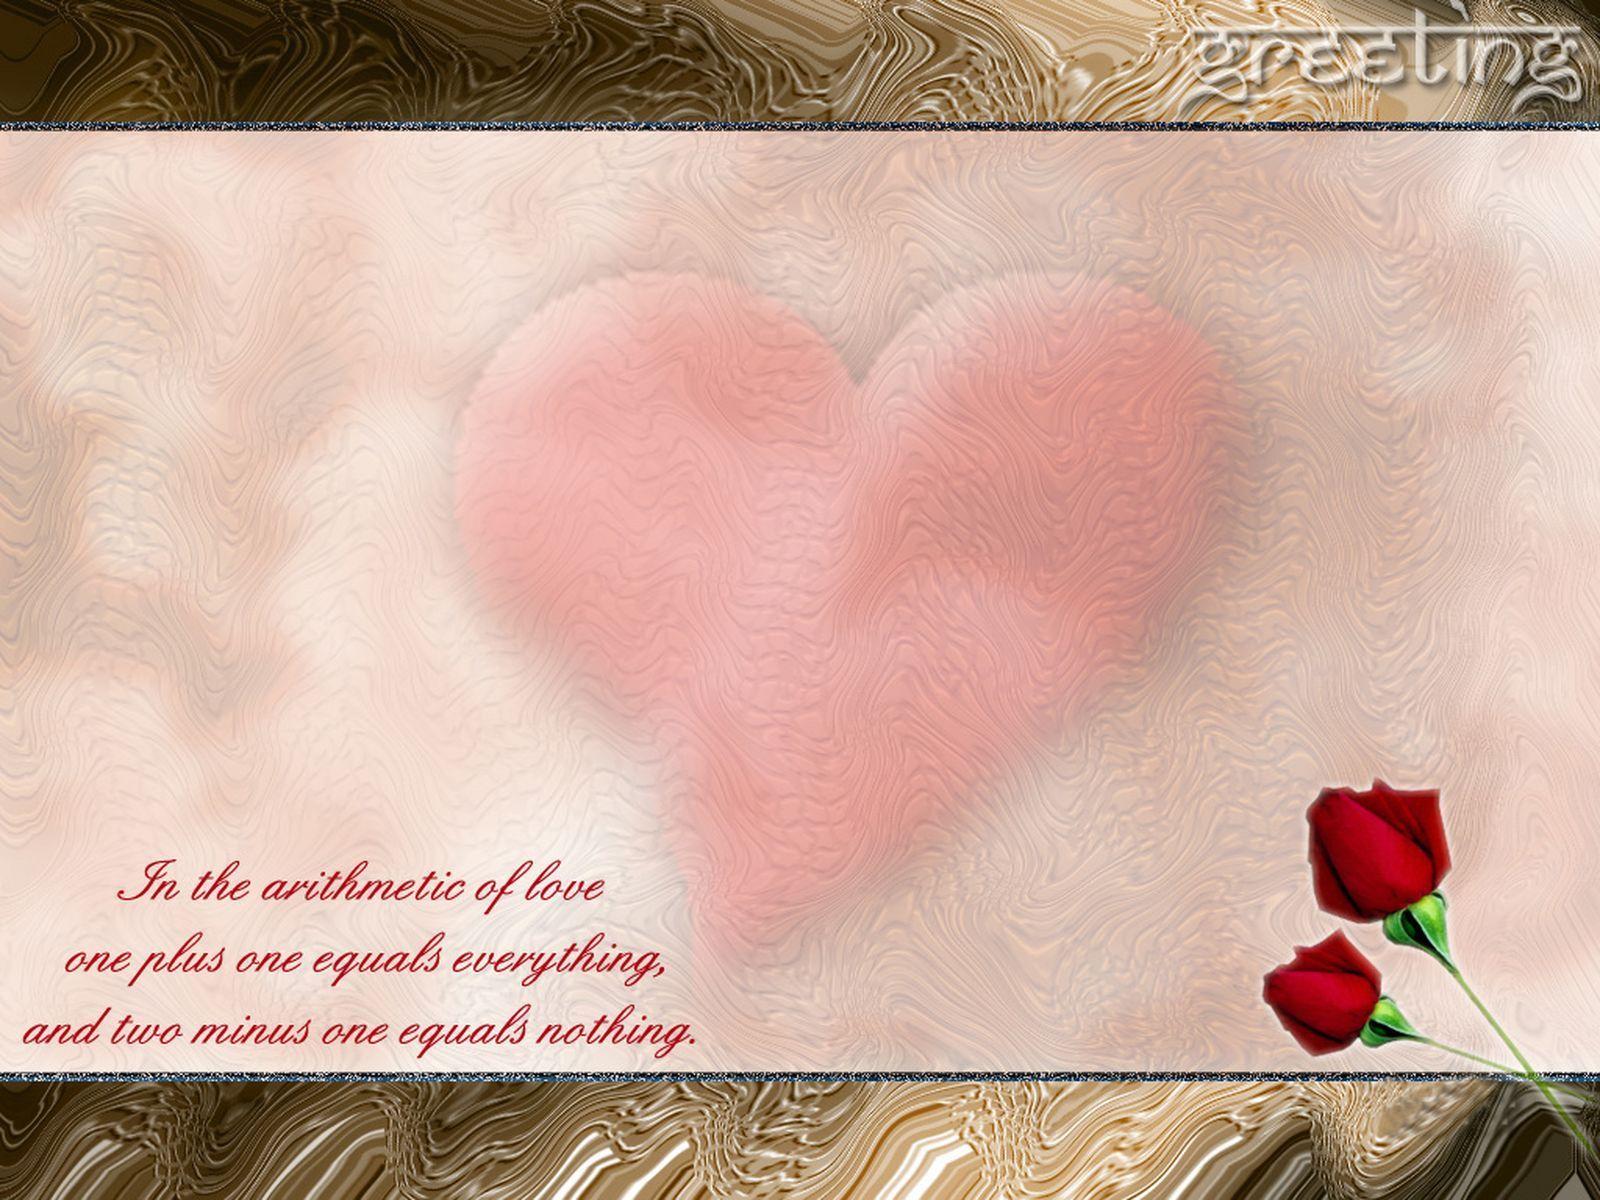 http://2.bp.blogspot.com/-O5fWmjfH-1Q/TmWn5I0DI8I/AAAAAAAAG00/uhi5oOMSUx0/s1600/Love-Wallpaper-love-2939261-1600-1200.jpg